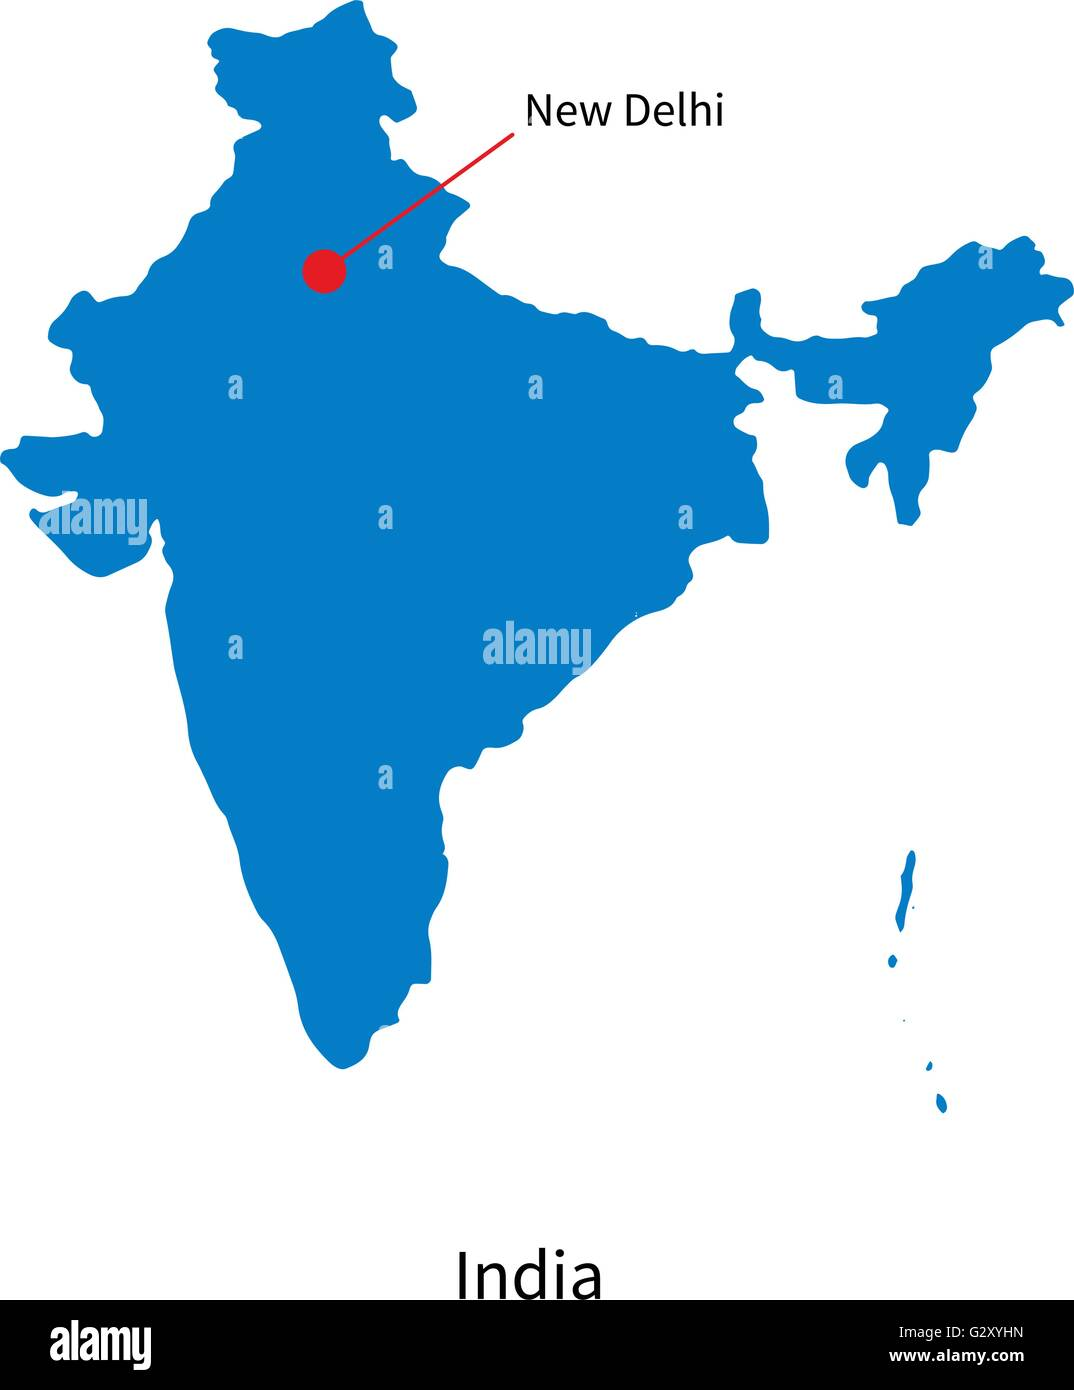 New Delhi India Map Detailed vector map of India and capital city New Delhi Stock